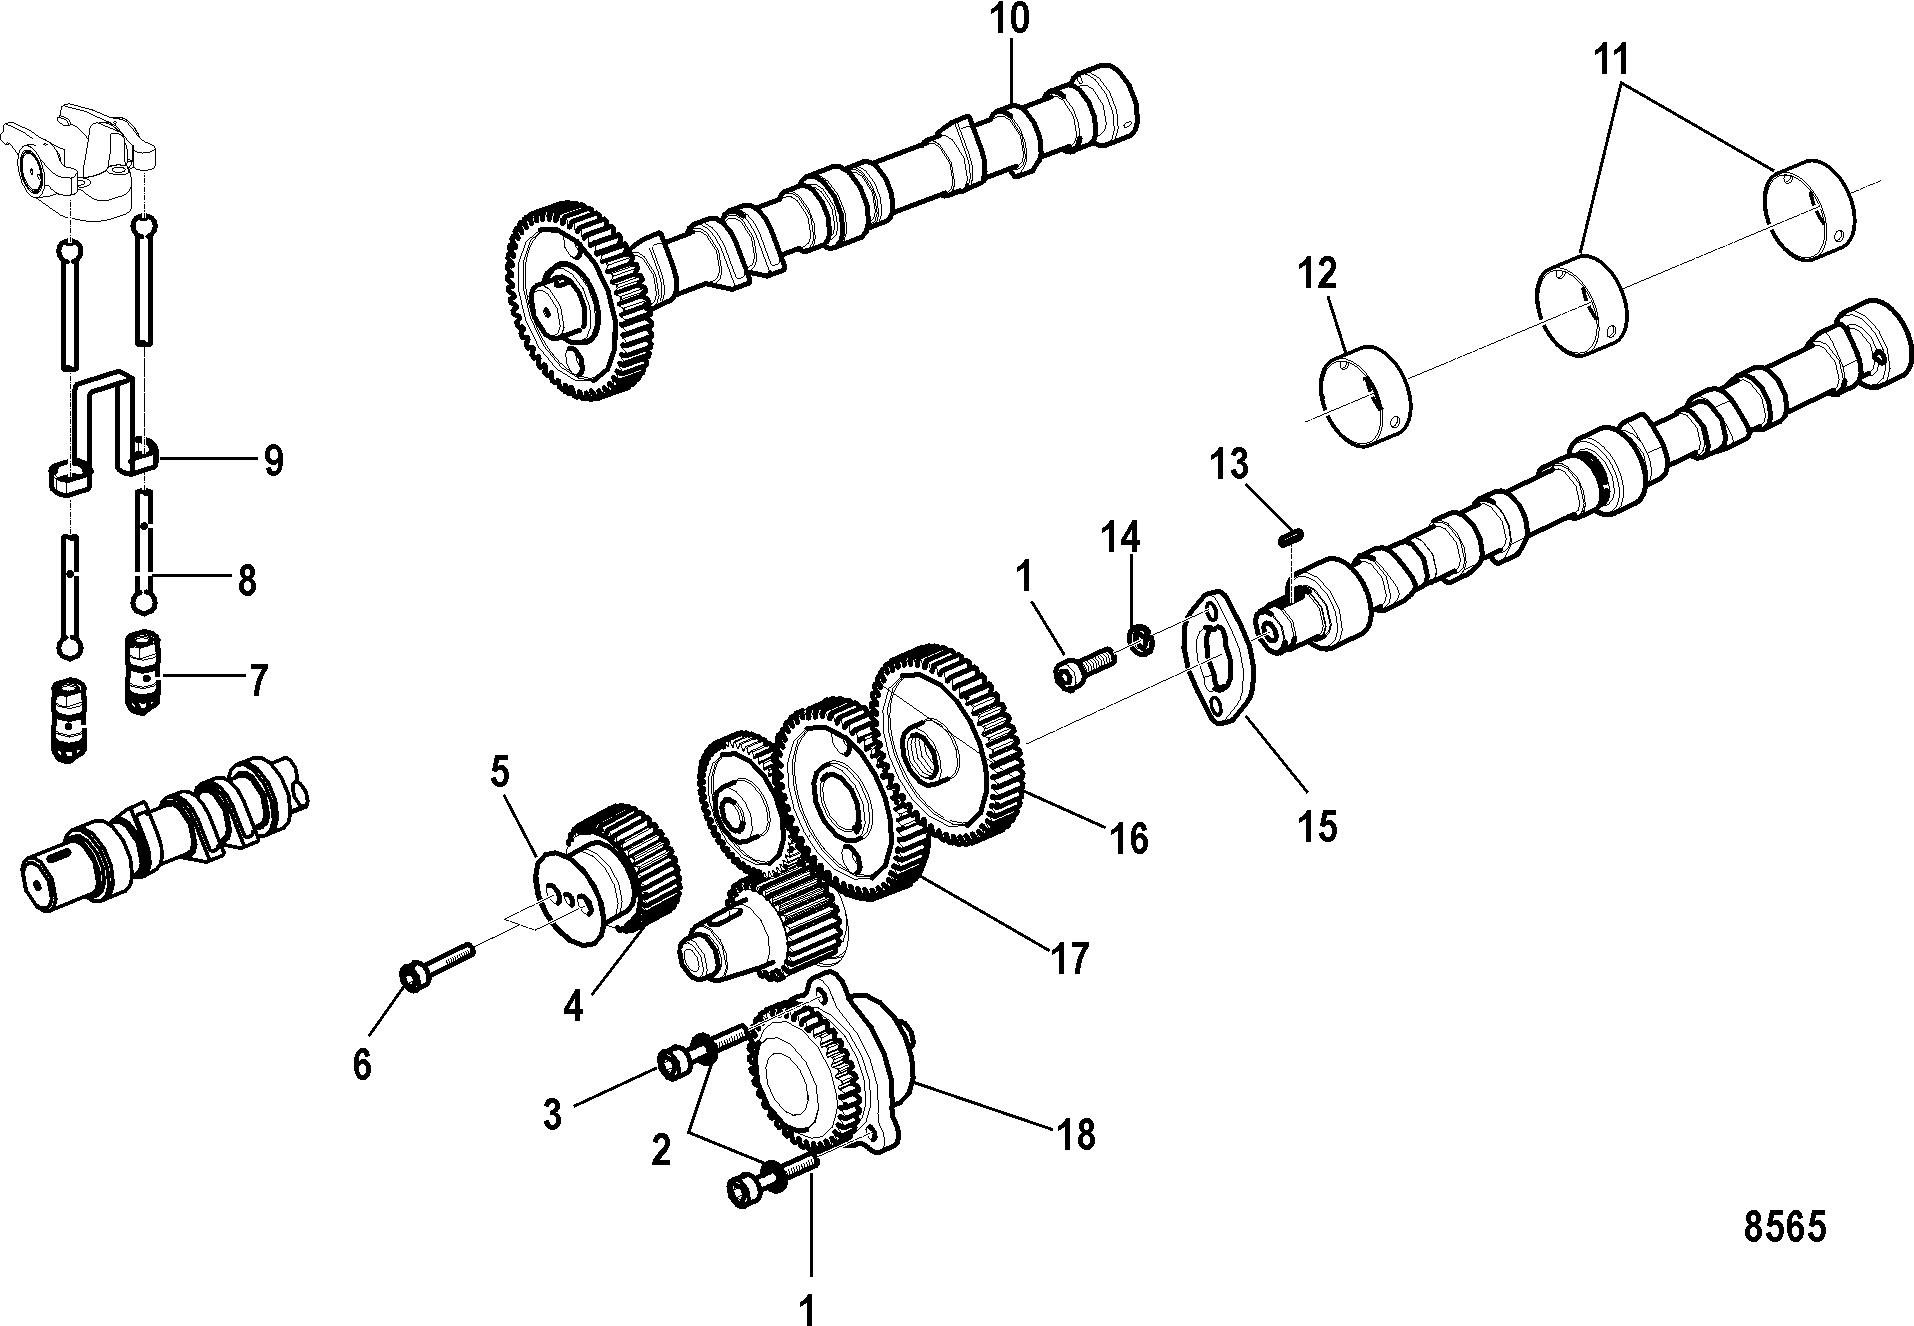 Lowe 170 Wiring Diagram Gibson Auto 170w For Four Winns